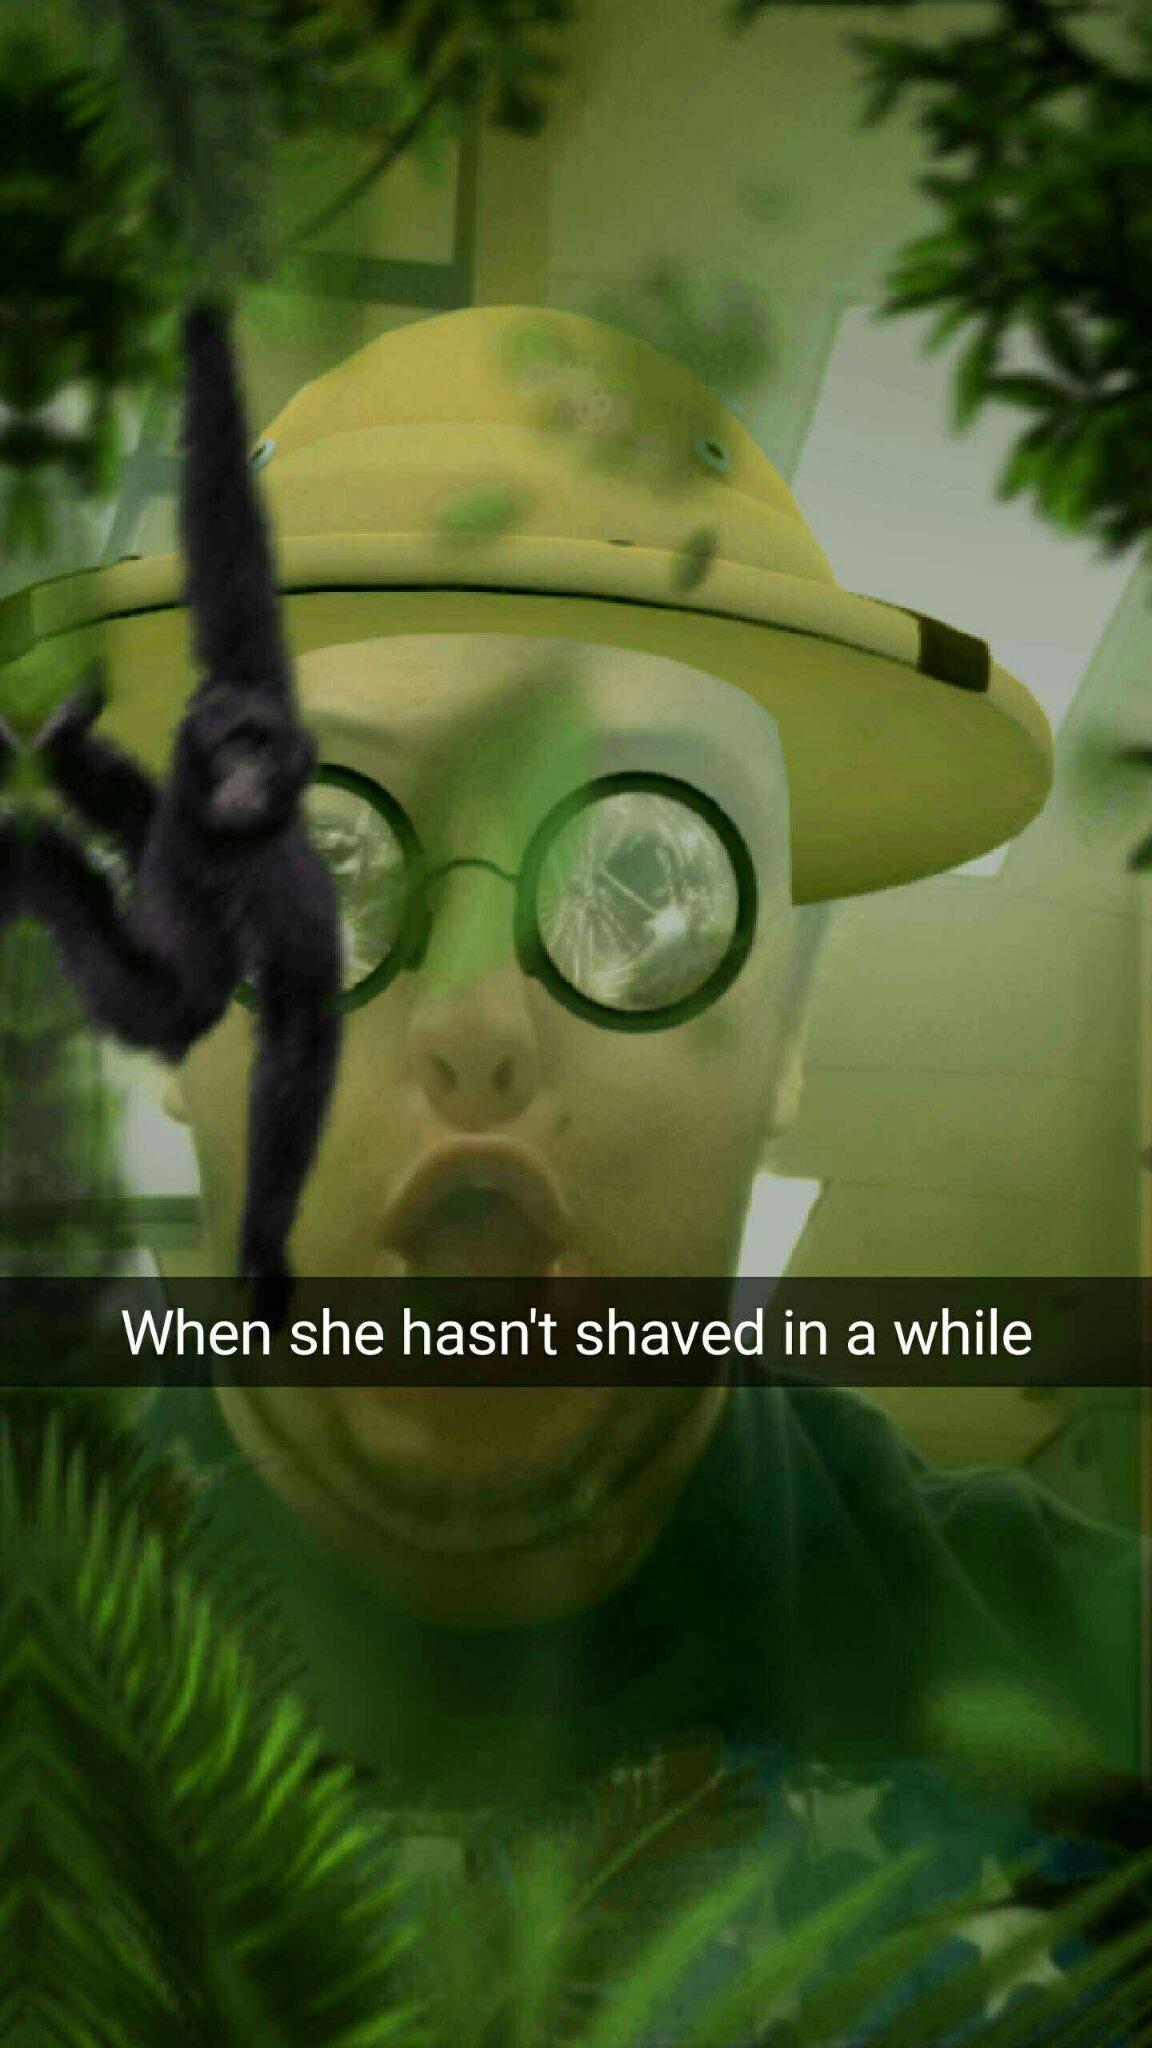 Le bush - meme